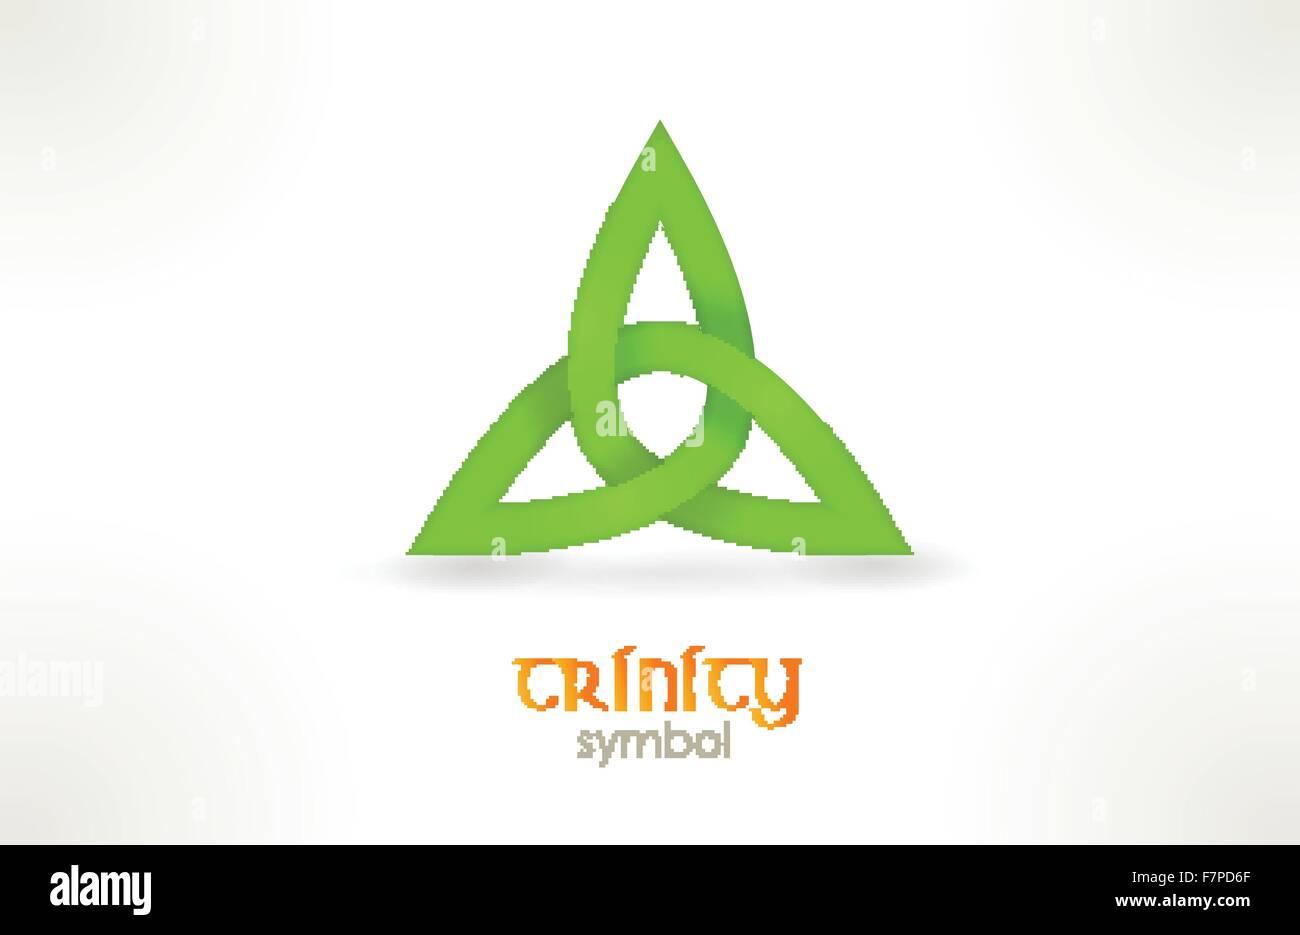 Trinity symbol, triqueta - Stock Vector